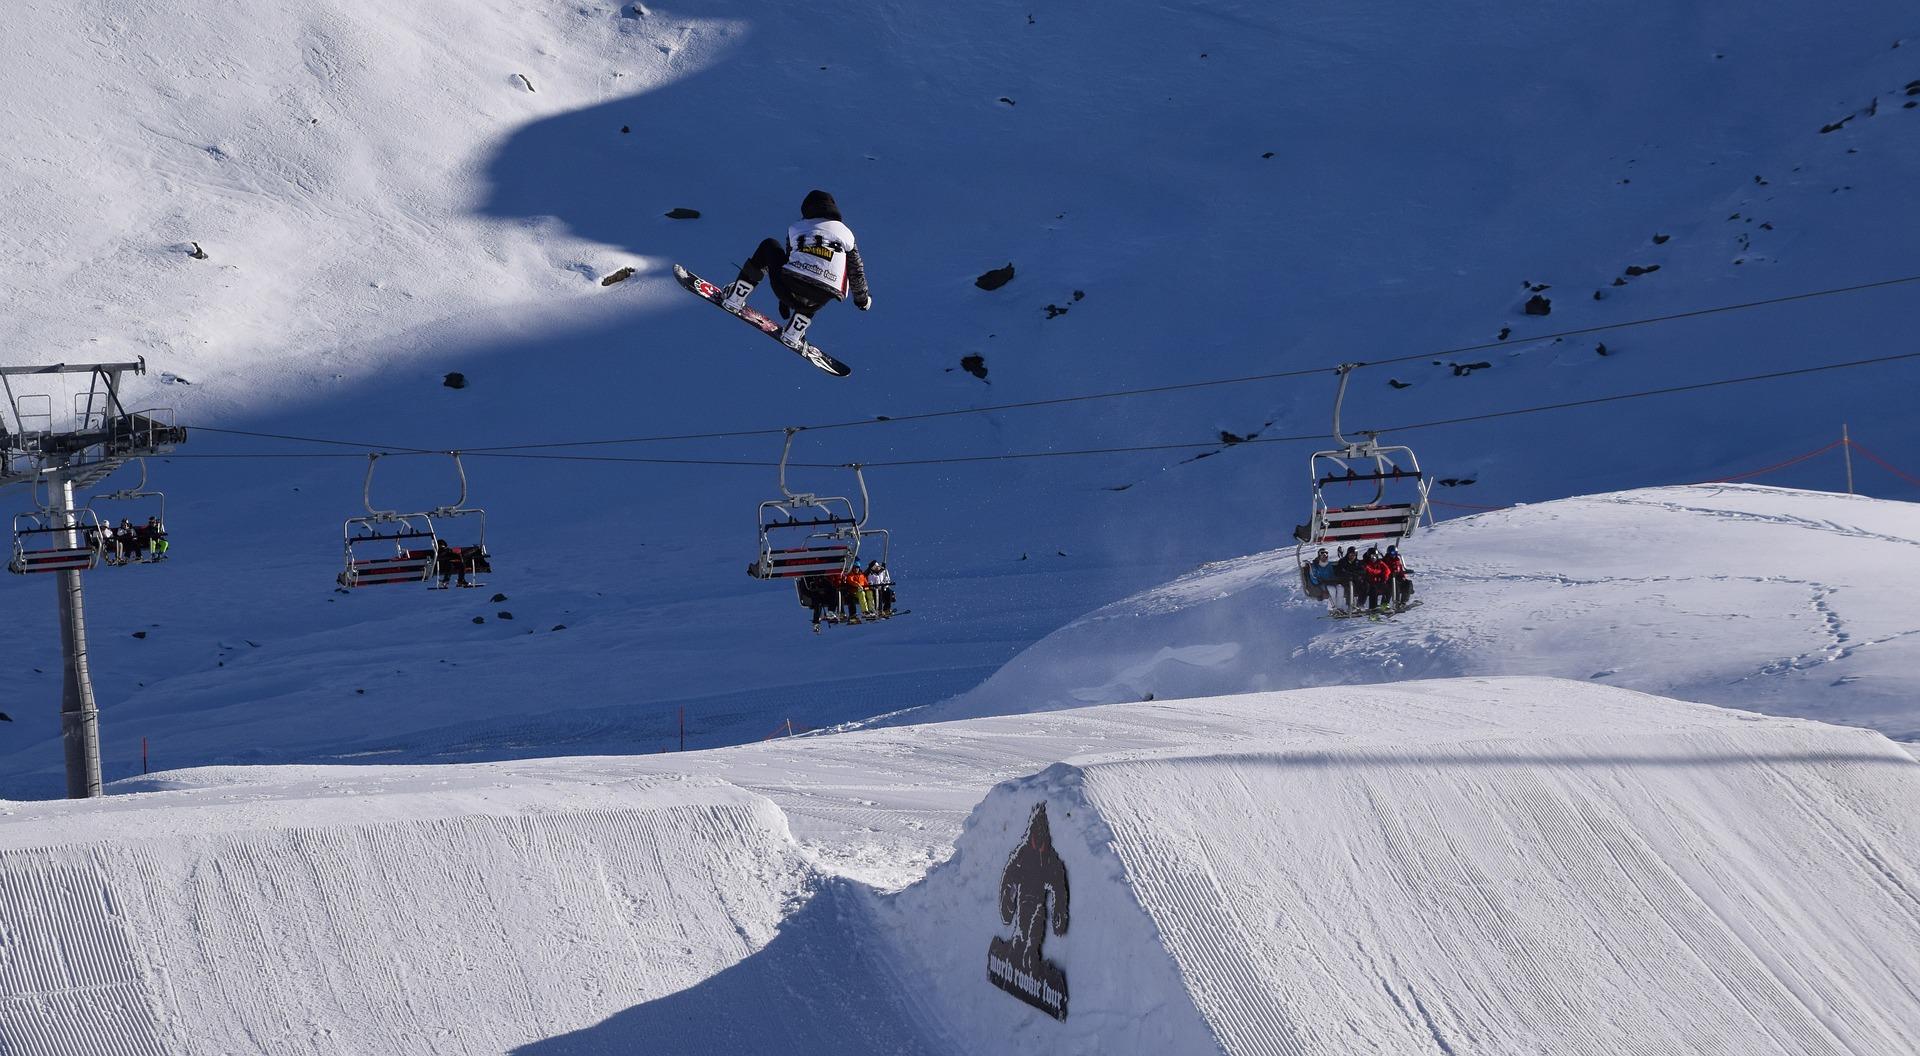 St. Moritz - 10 Top Ski Resorts in Switzerland